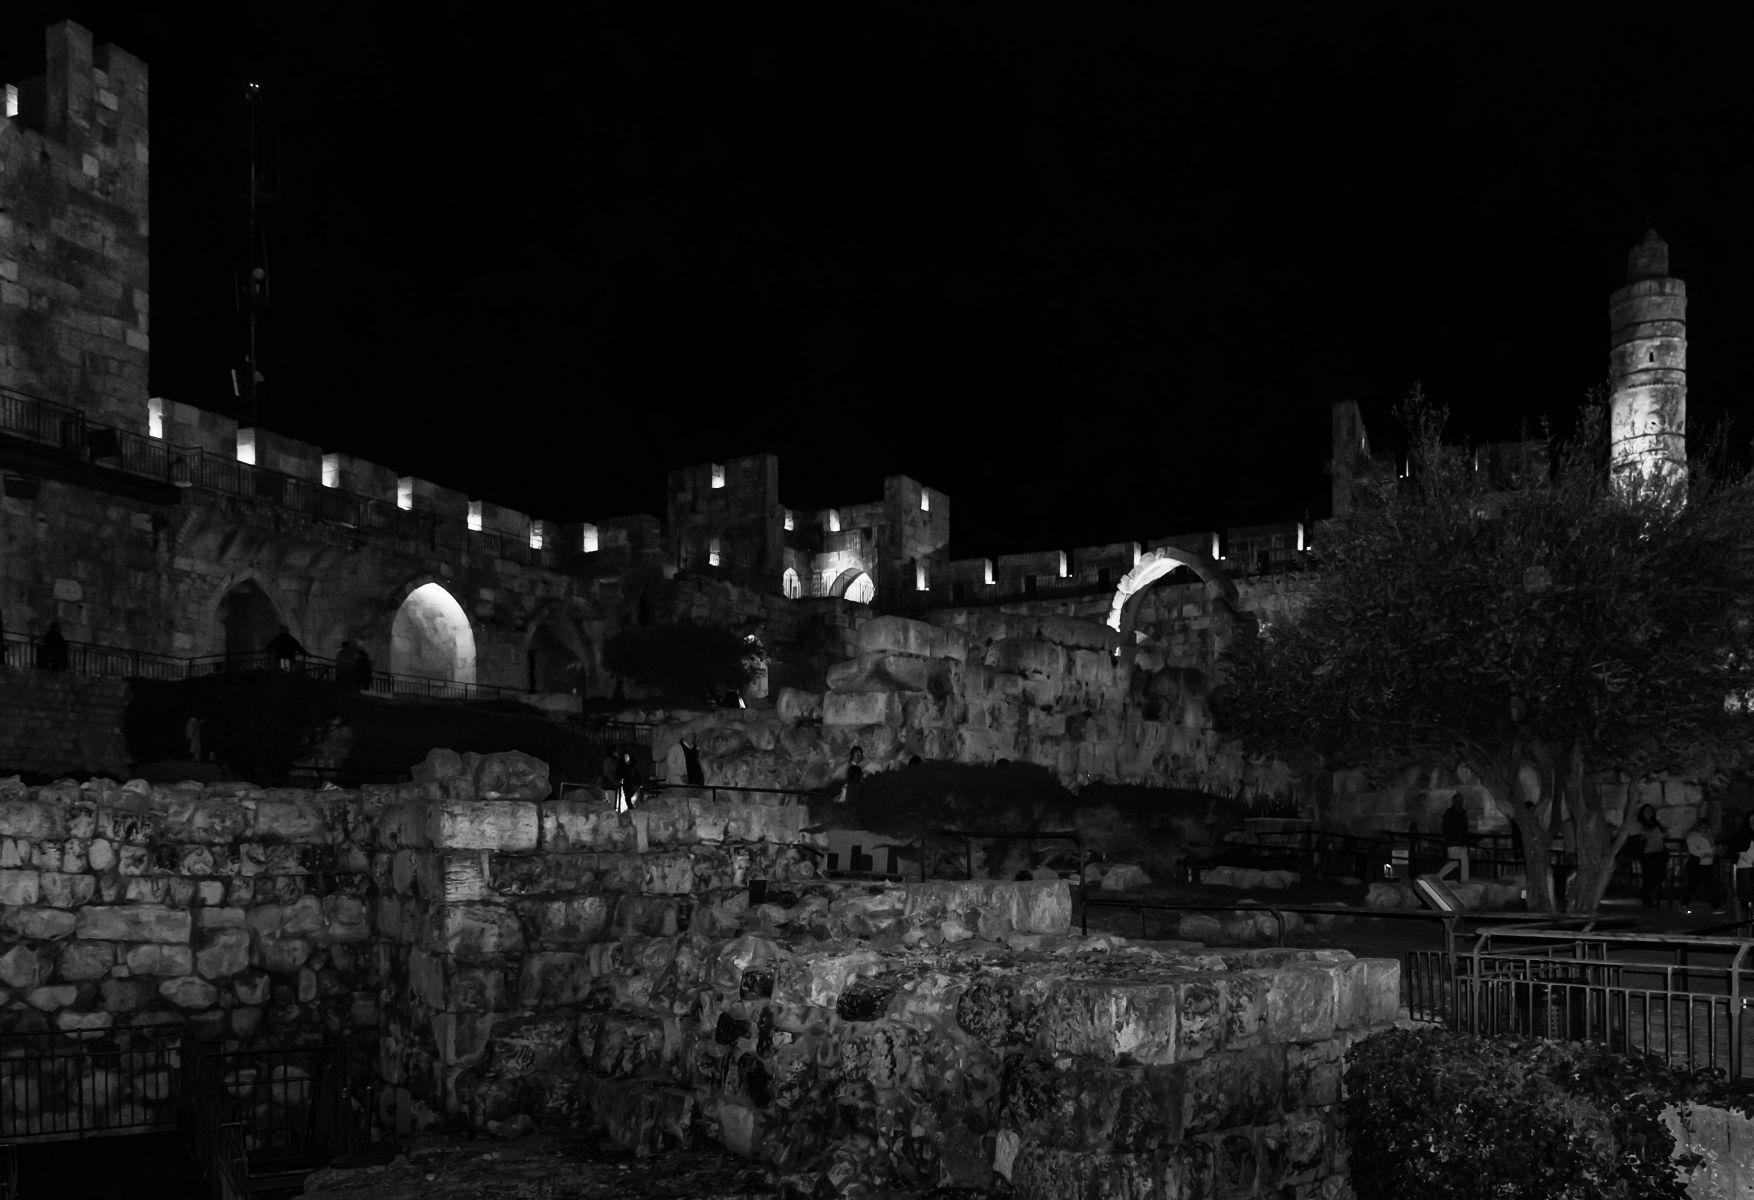 Jerusalem, Israel 04/20/15